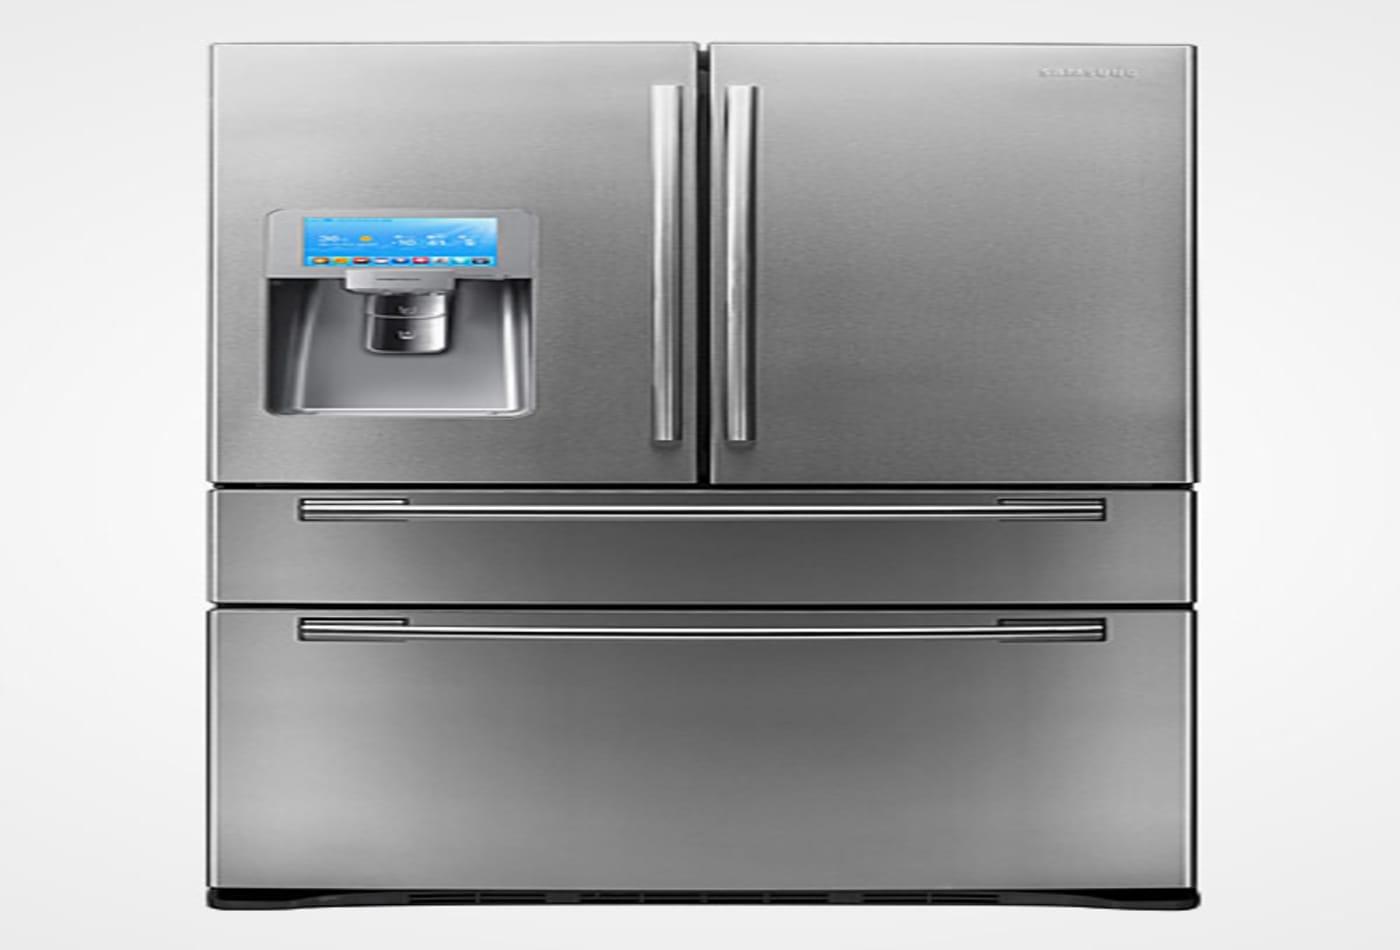 10-Smart-Dig-Appliances-Samsung-Refrigerator-.jpg